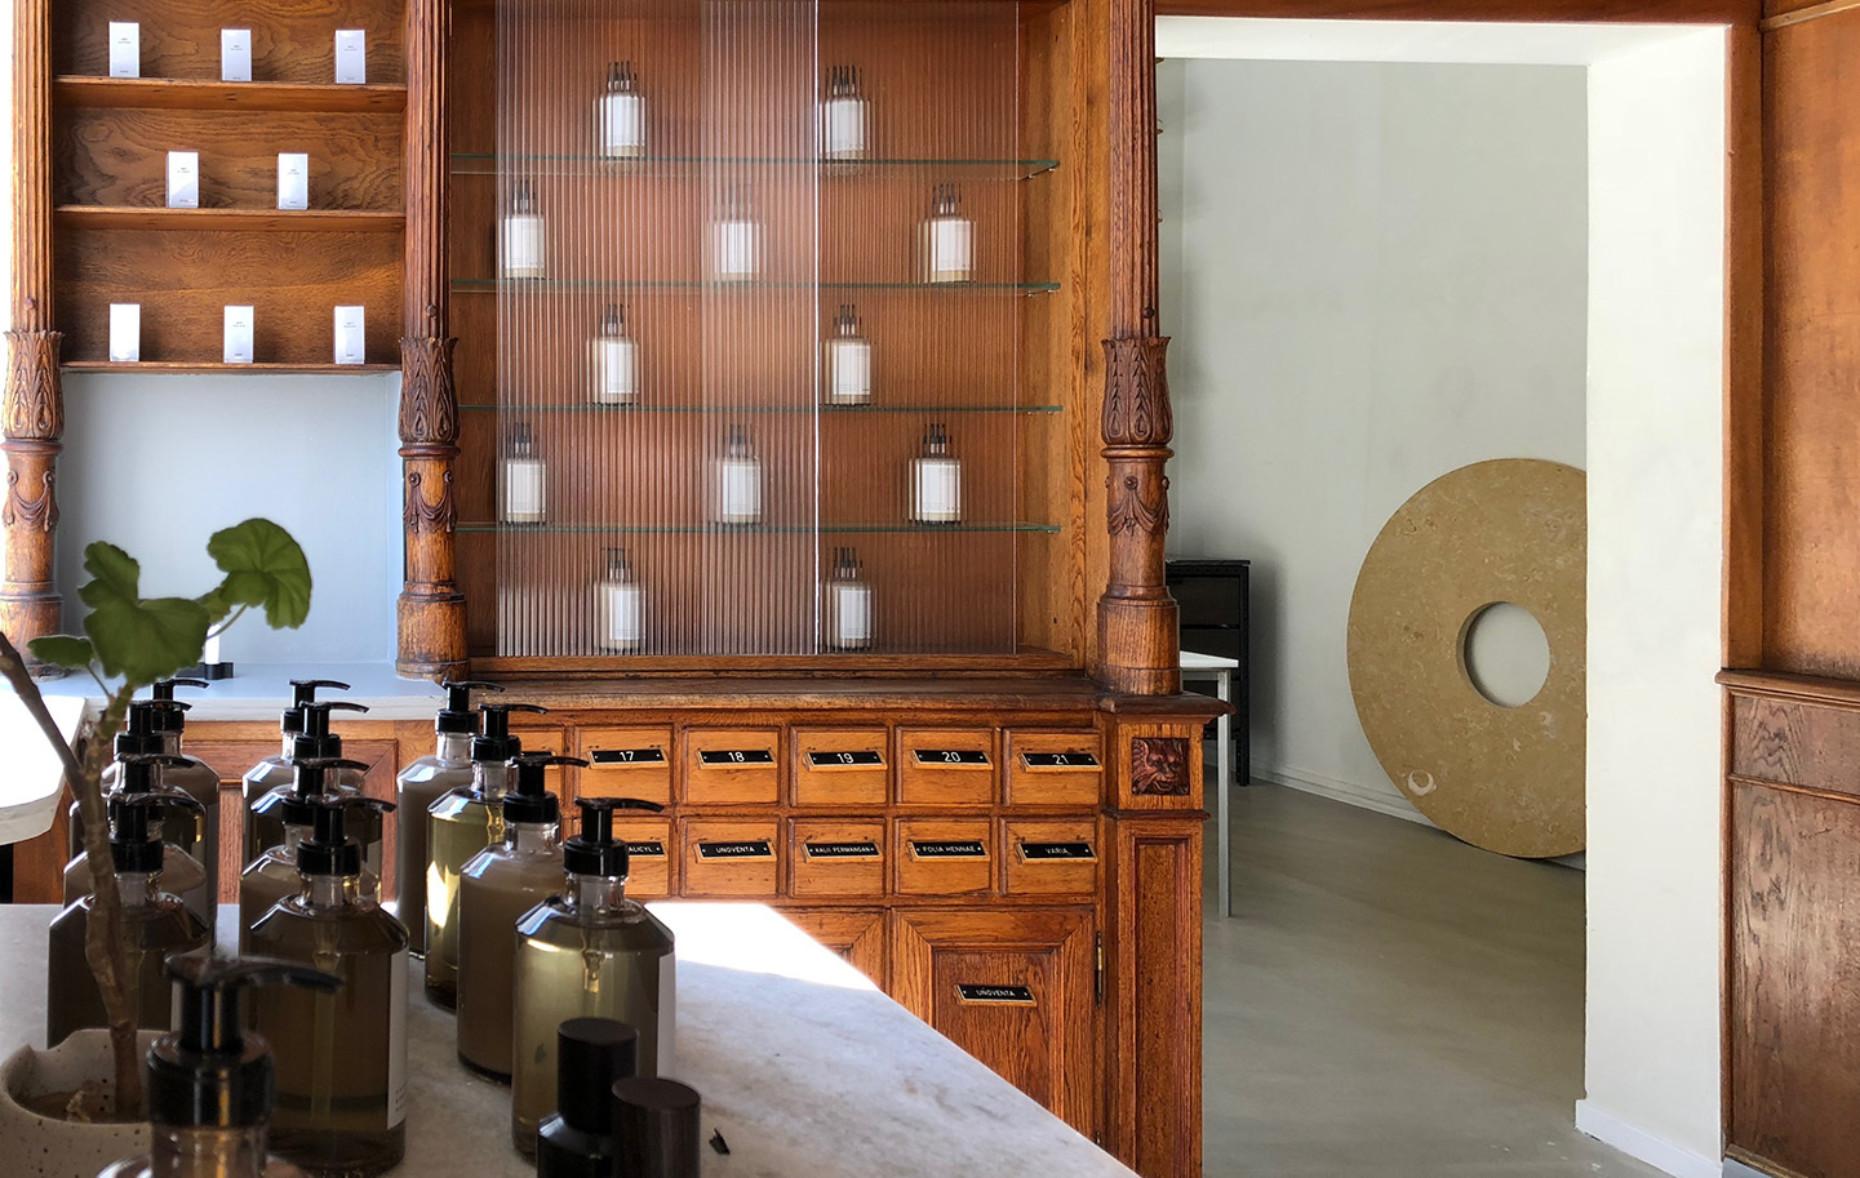 Frama Studio Store in den Räumen der ehemaligen St. Pauls Apotek